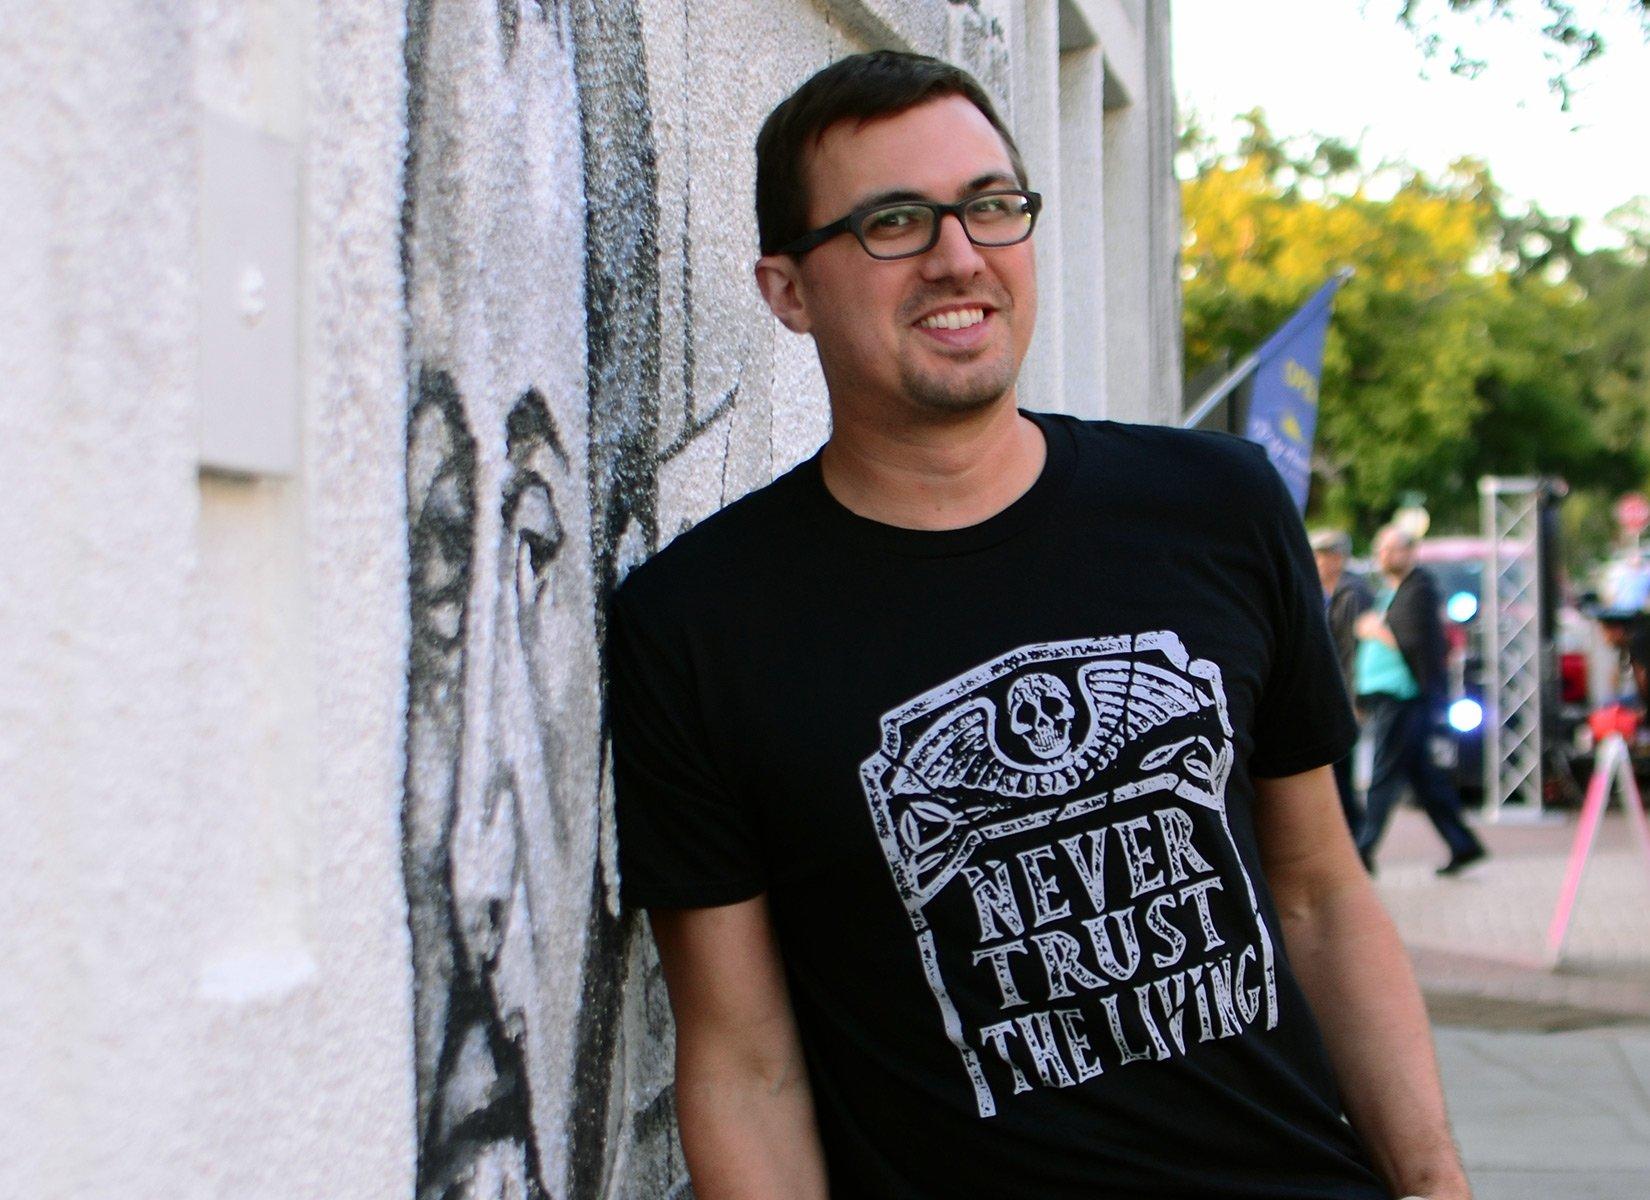 Never Trust The Living on Mens T-Shirt